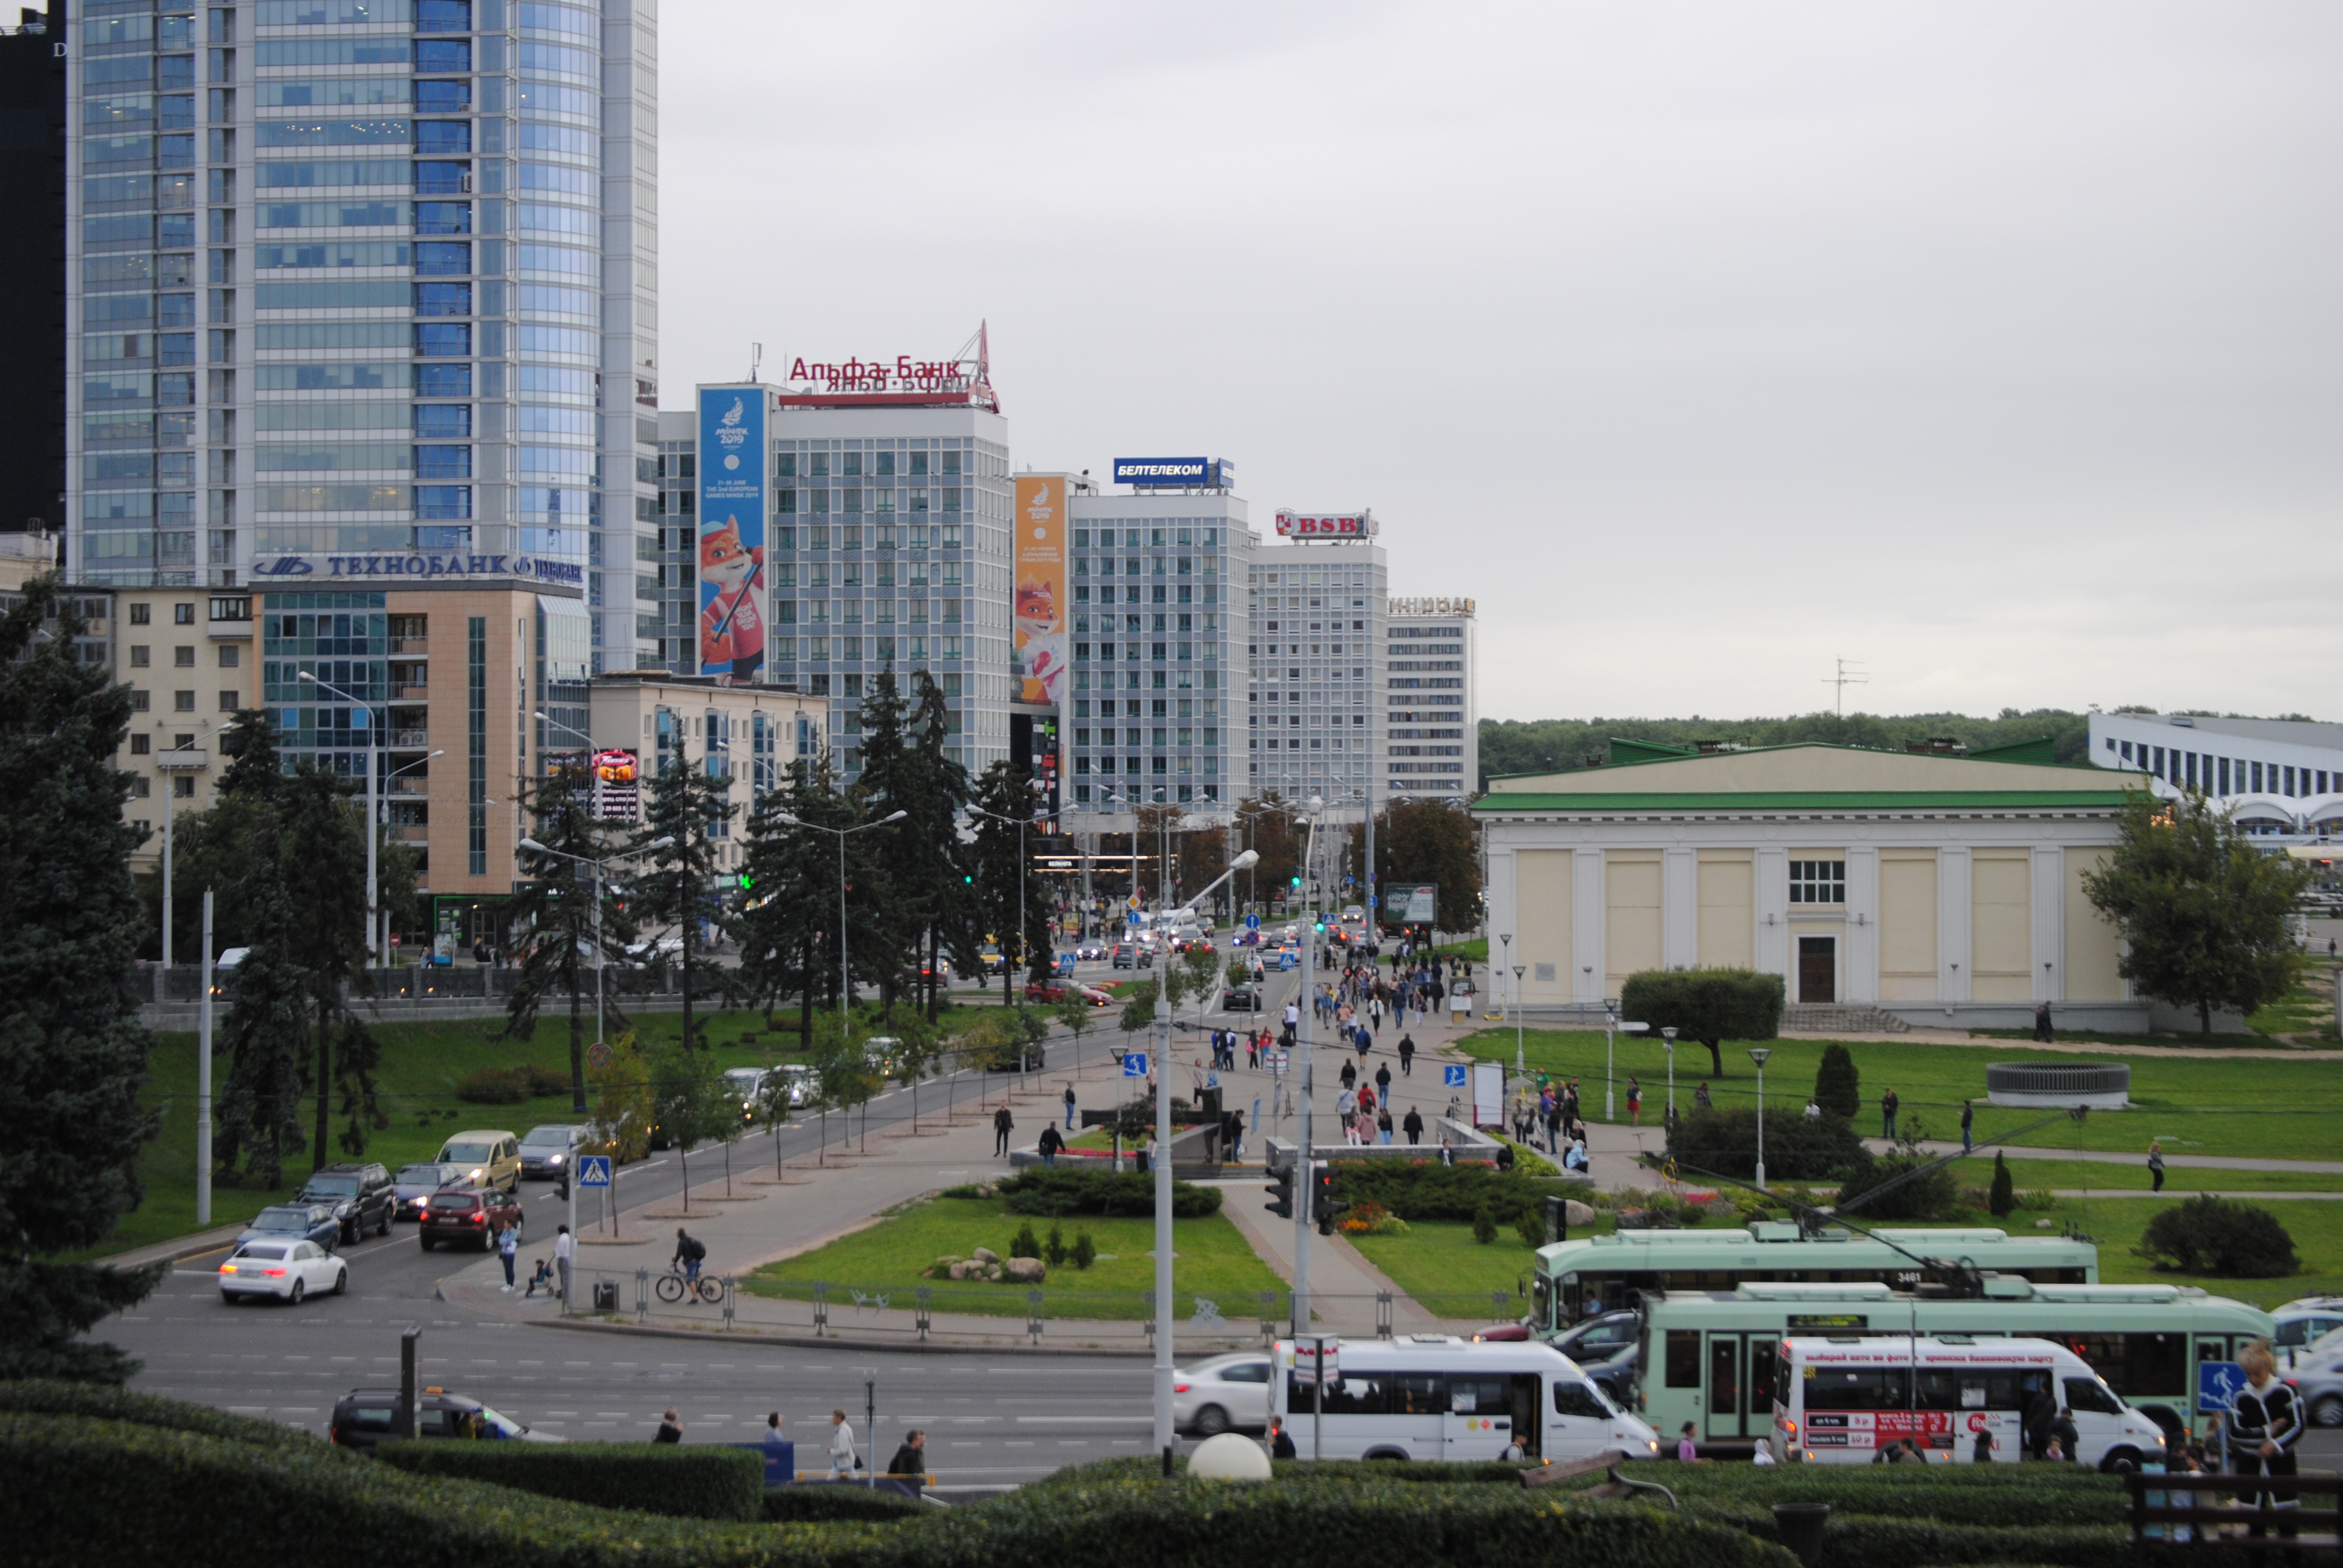 autobuses urbanos de Minsk